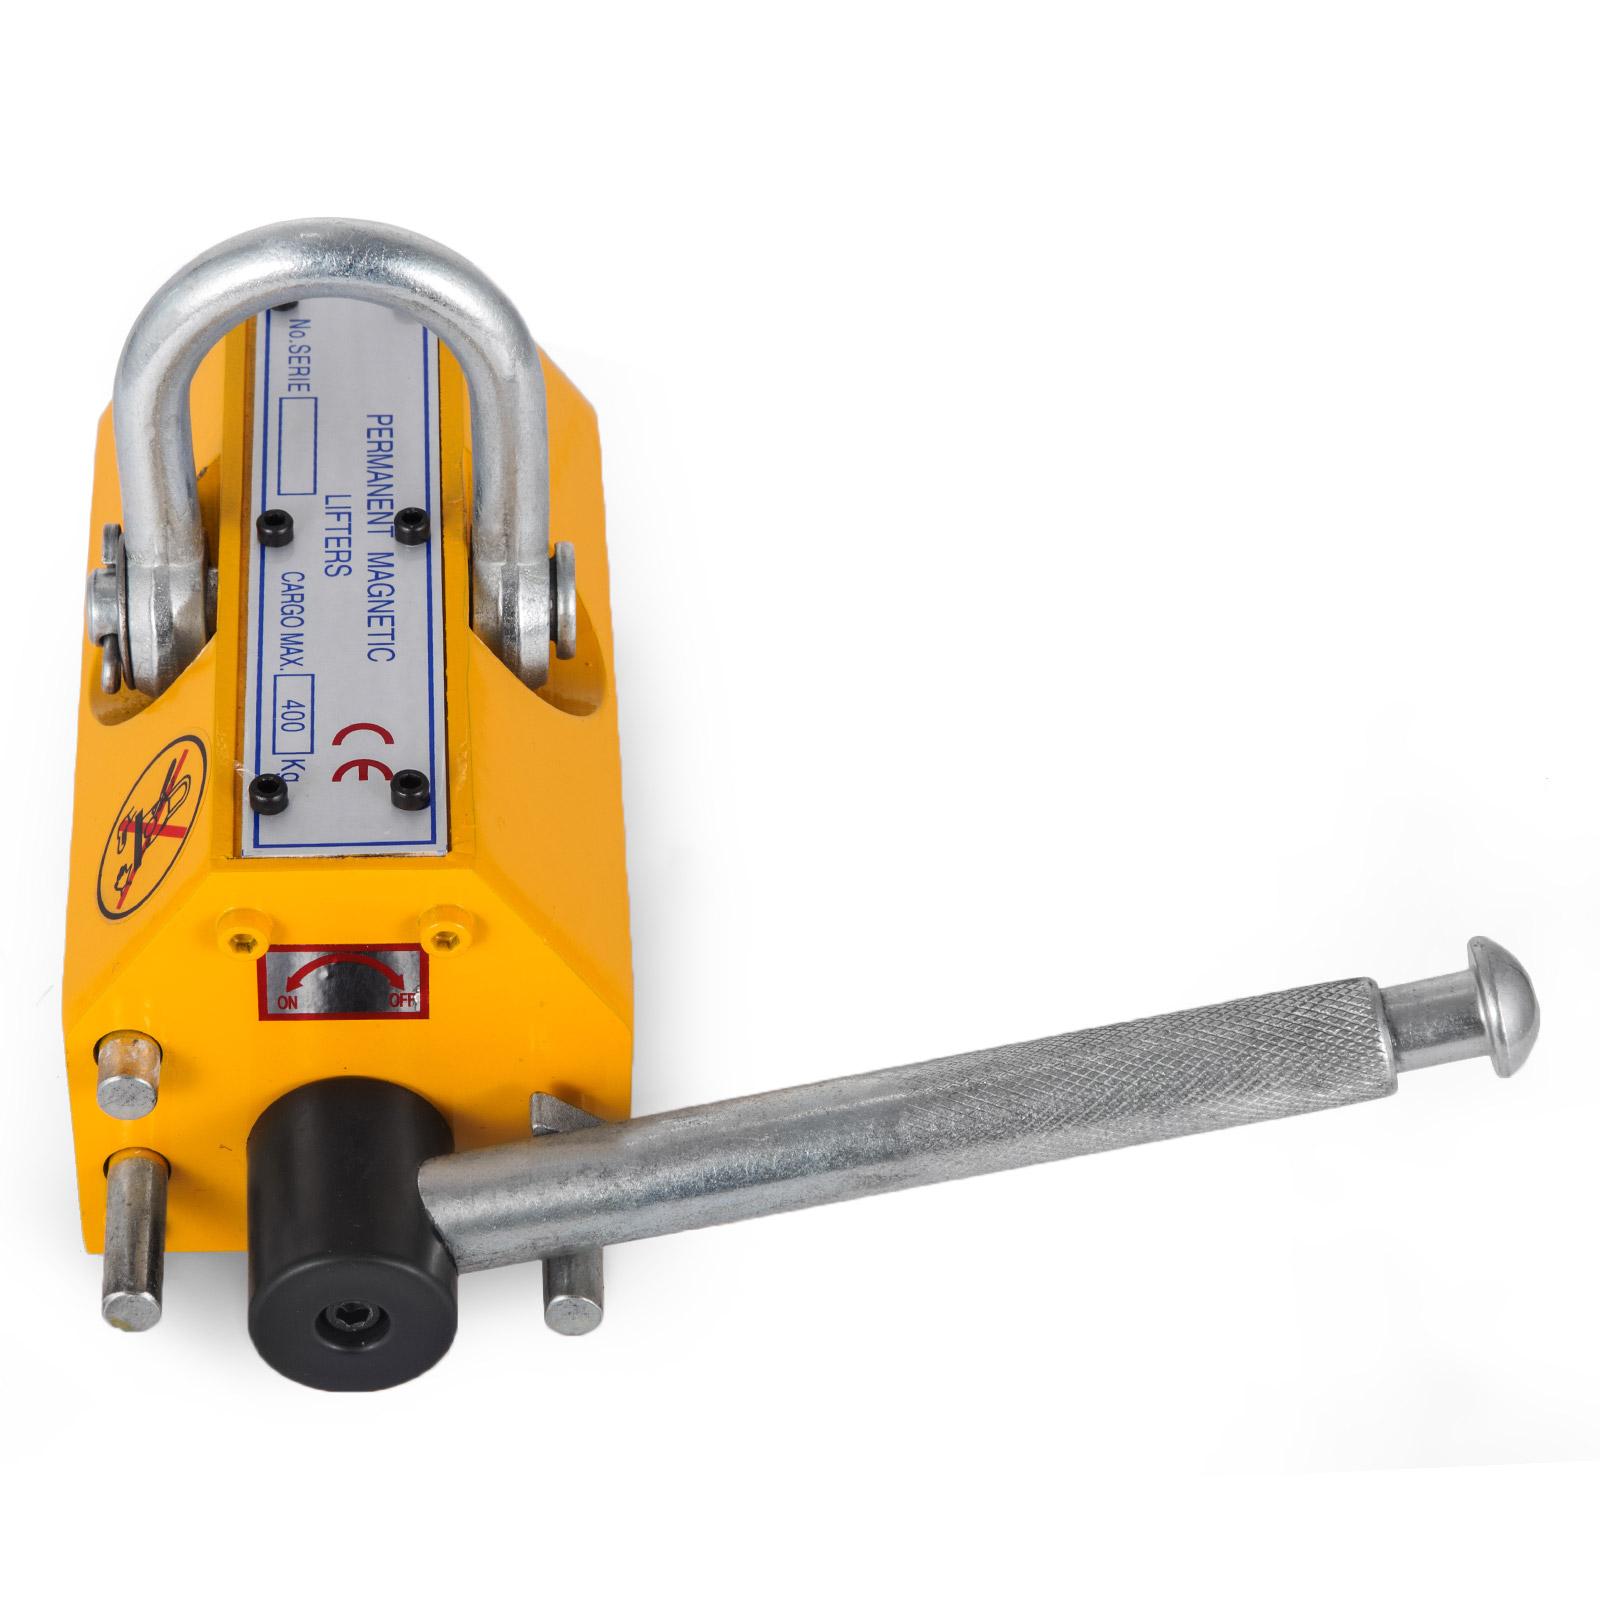 100-300-600-1000KG-Steel-Magnetic-Lifter-Heavy-Duty-Crane-Hoist-Lifting-Magnet miniature 39